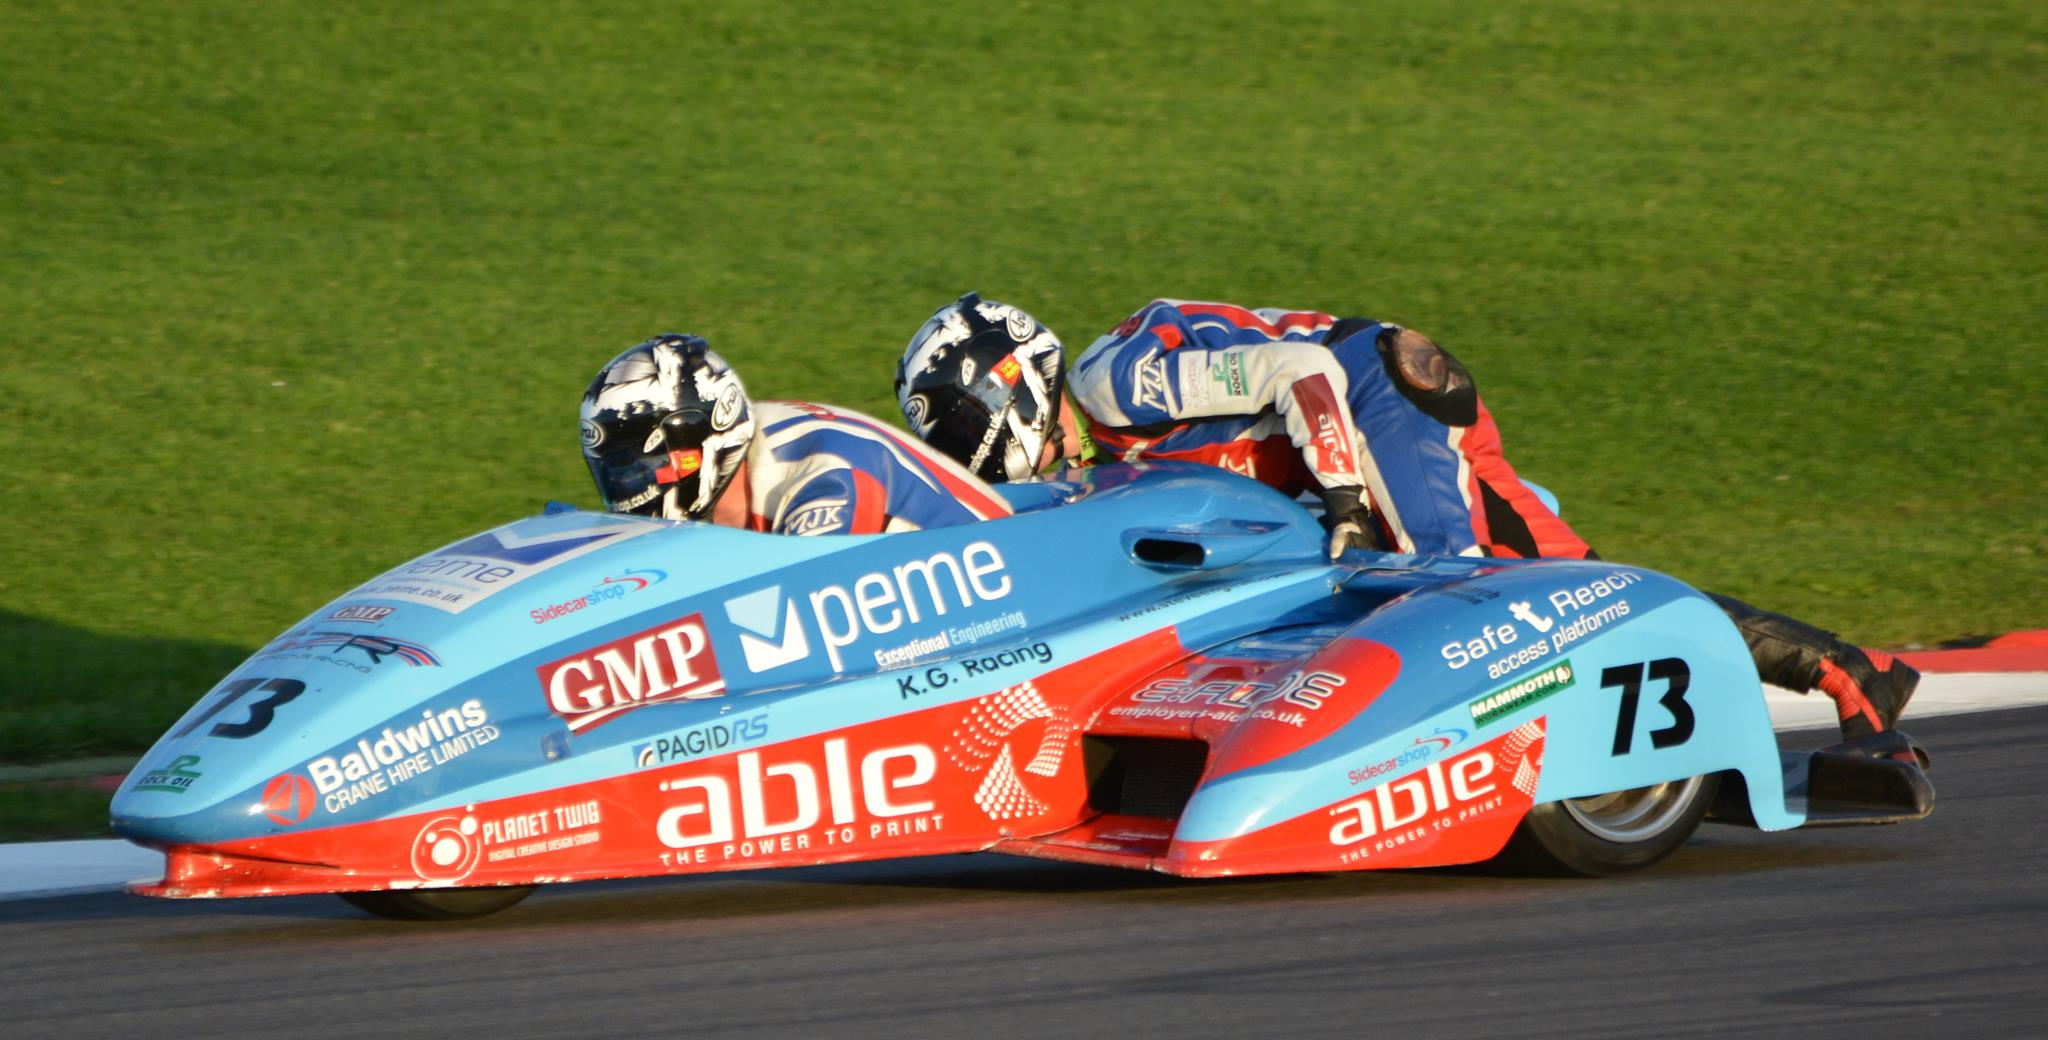 PEME CTR at Silverstone